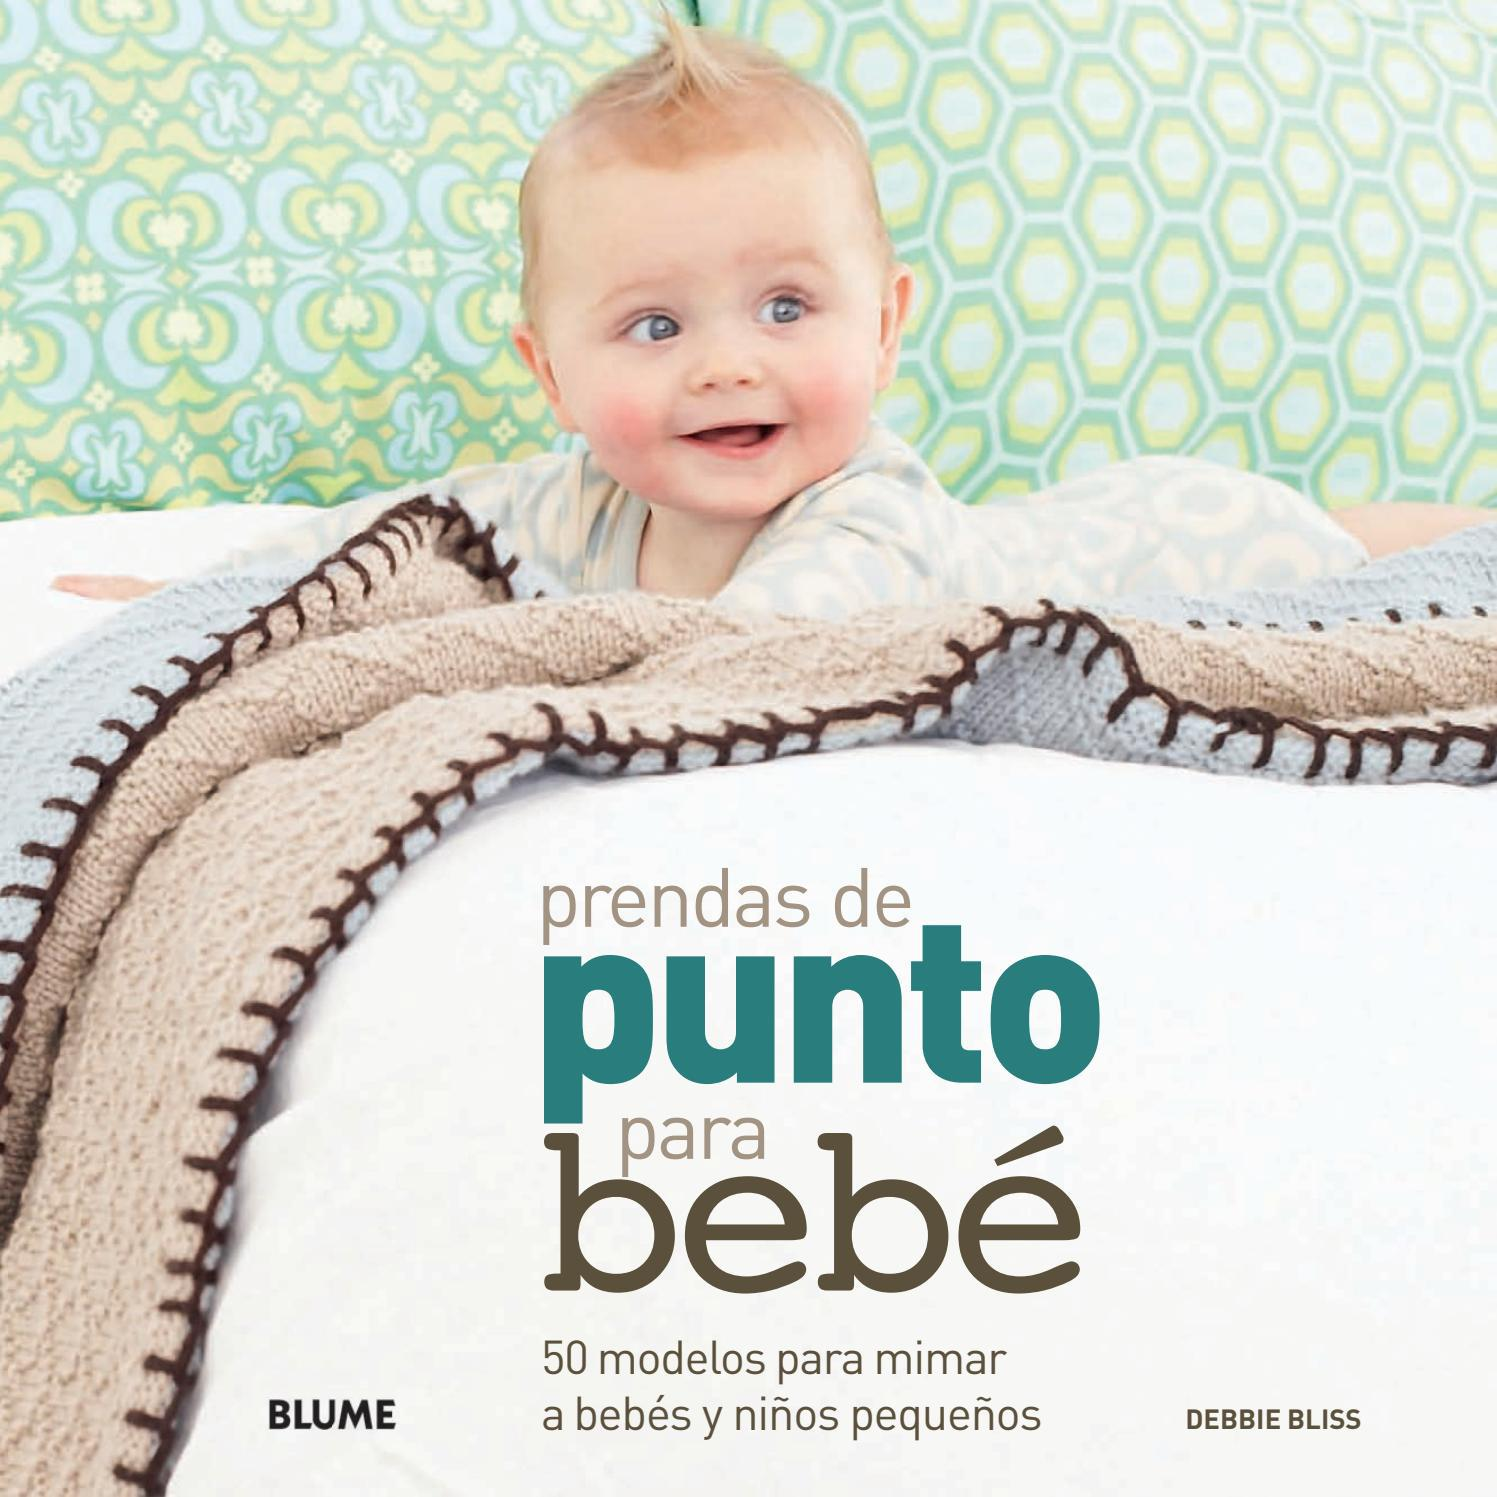 Prendas de punto para bebes by Editorial Blume - issuu